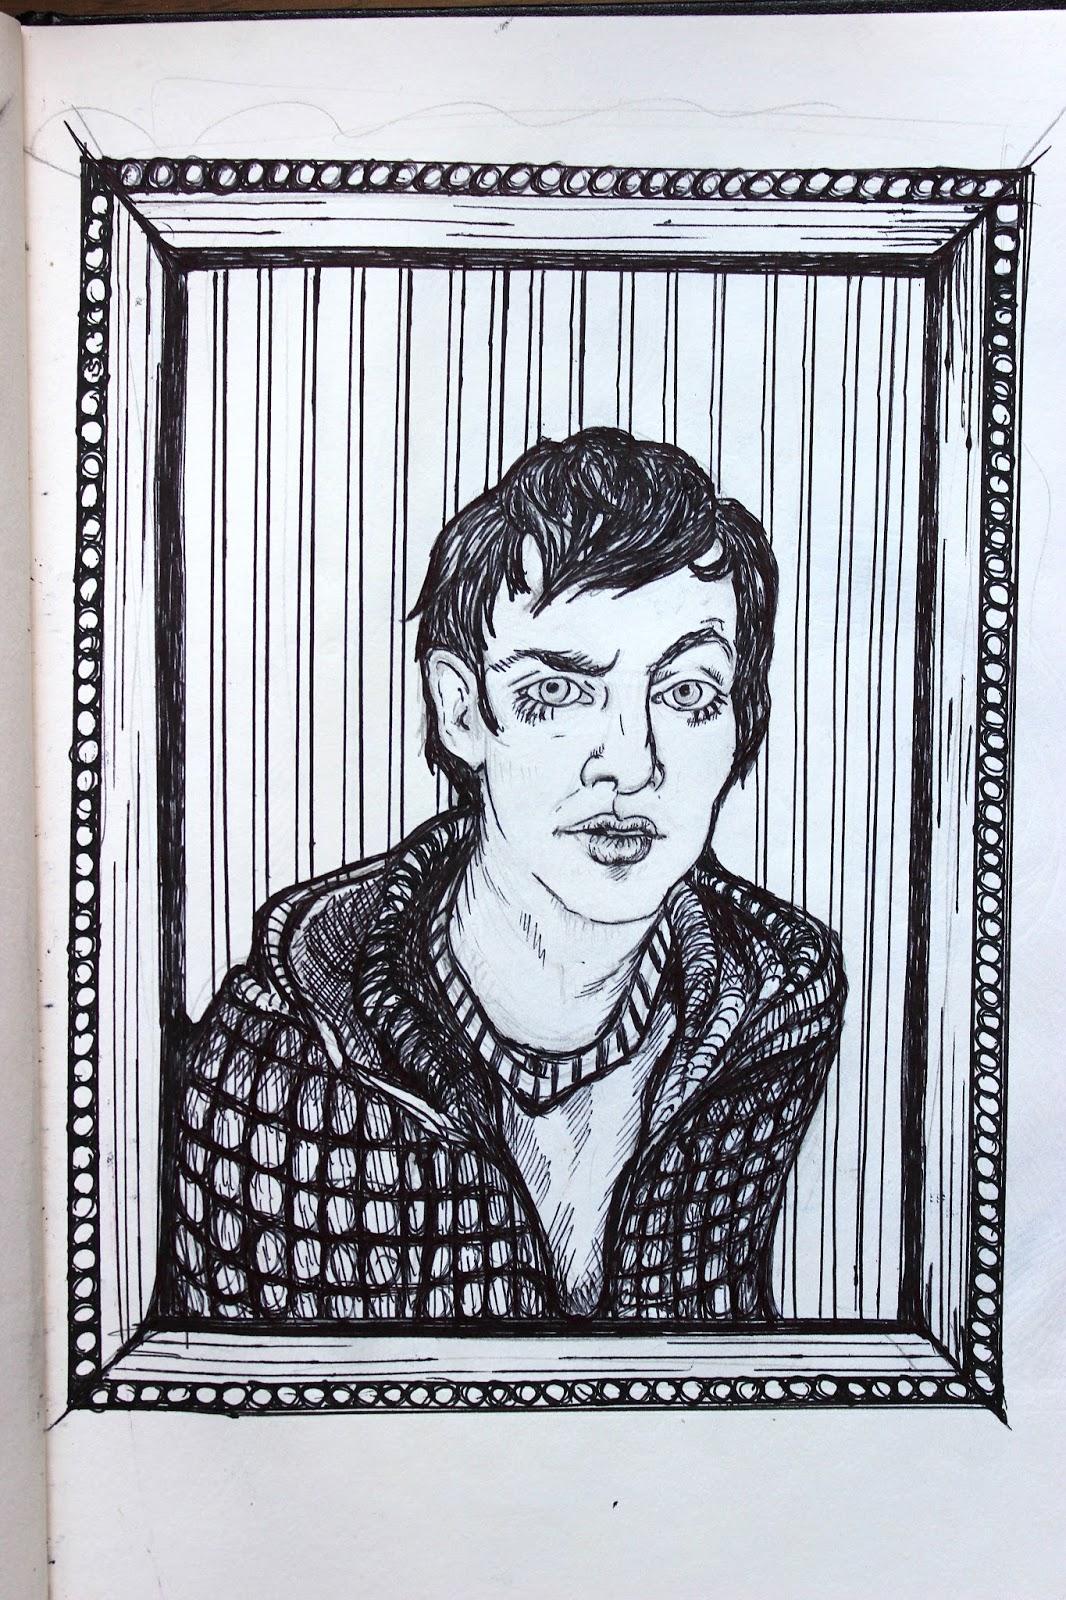 Sketchpad Notebook Sketch Drawing Pencil Portrait Miles Eyebrow Pen